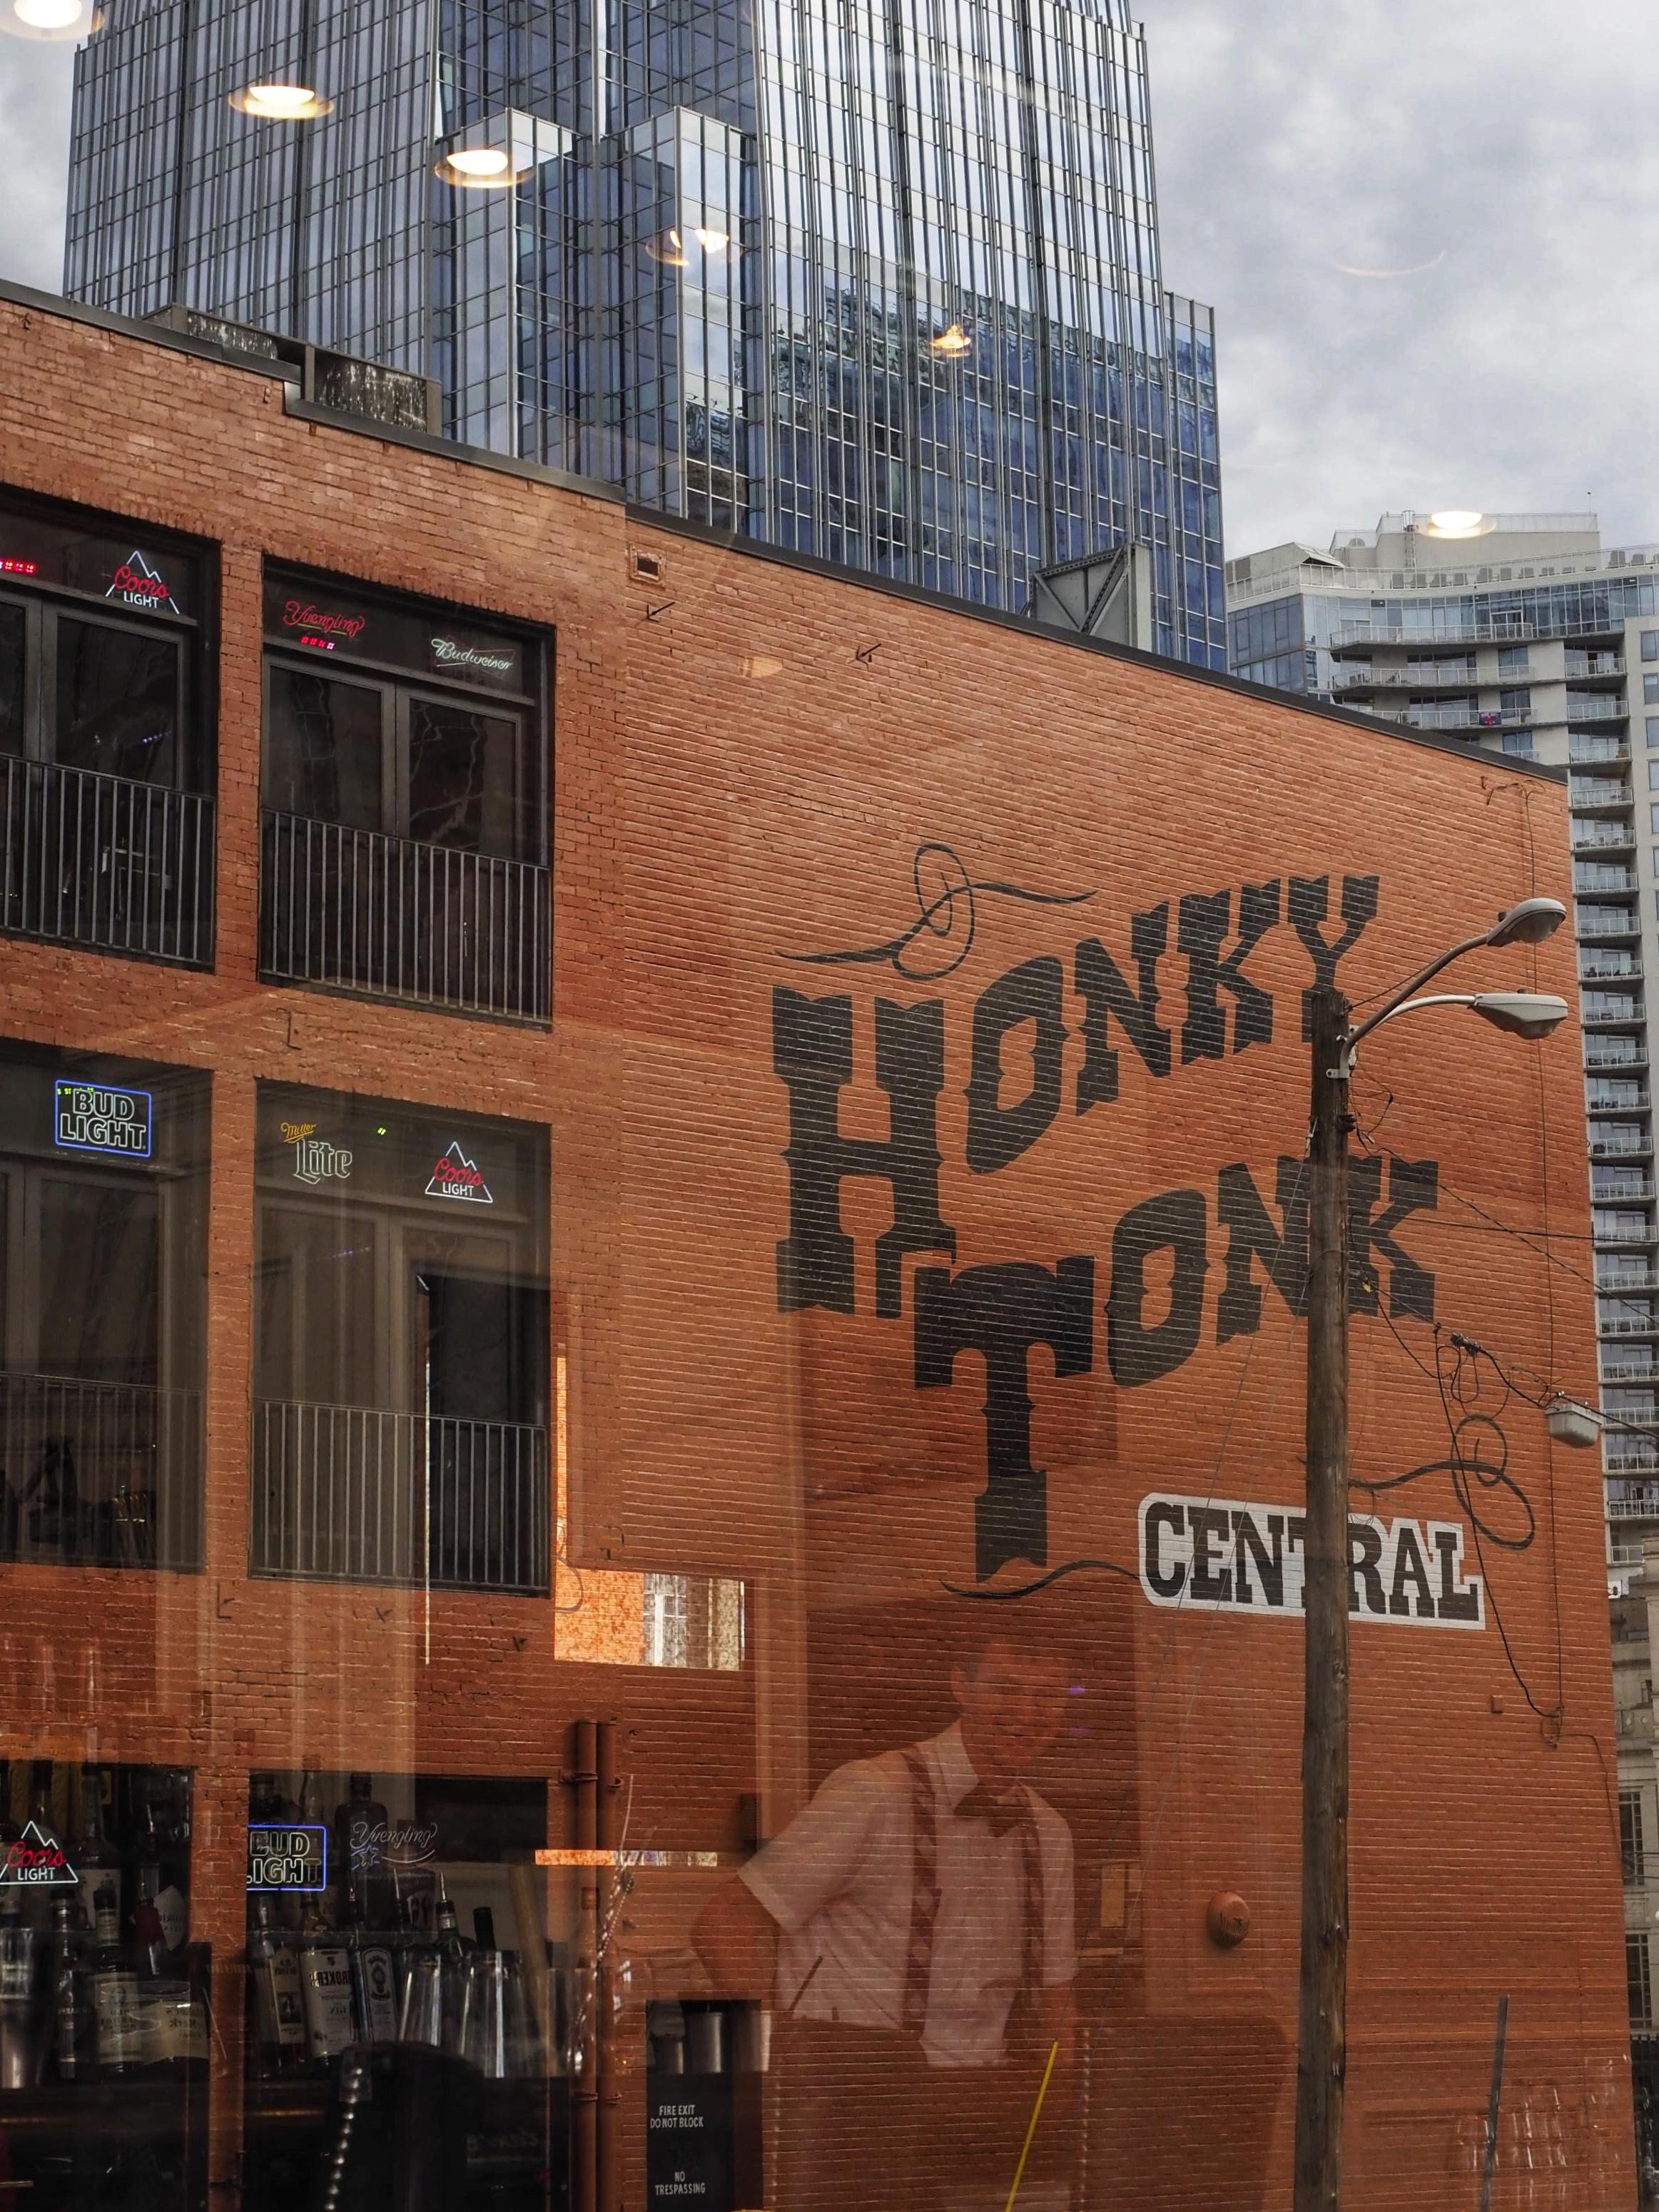 Nashville Honky Tonk Central 2018.